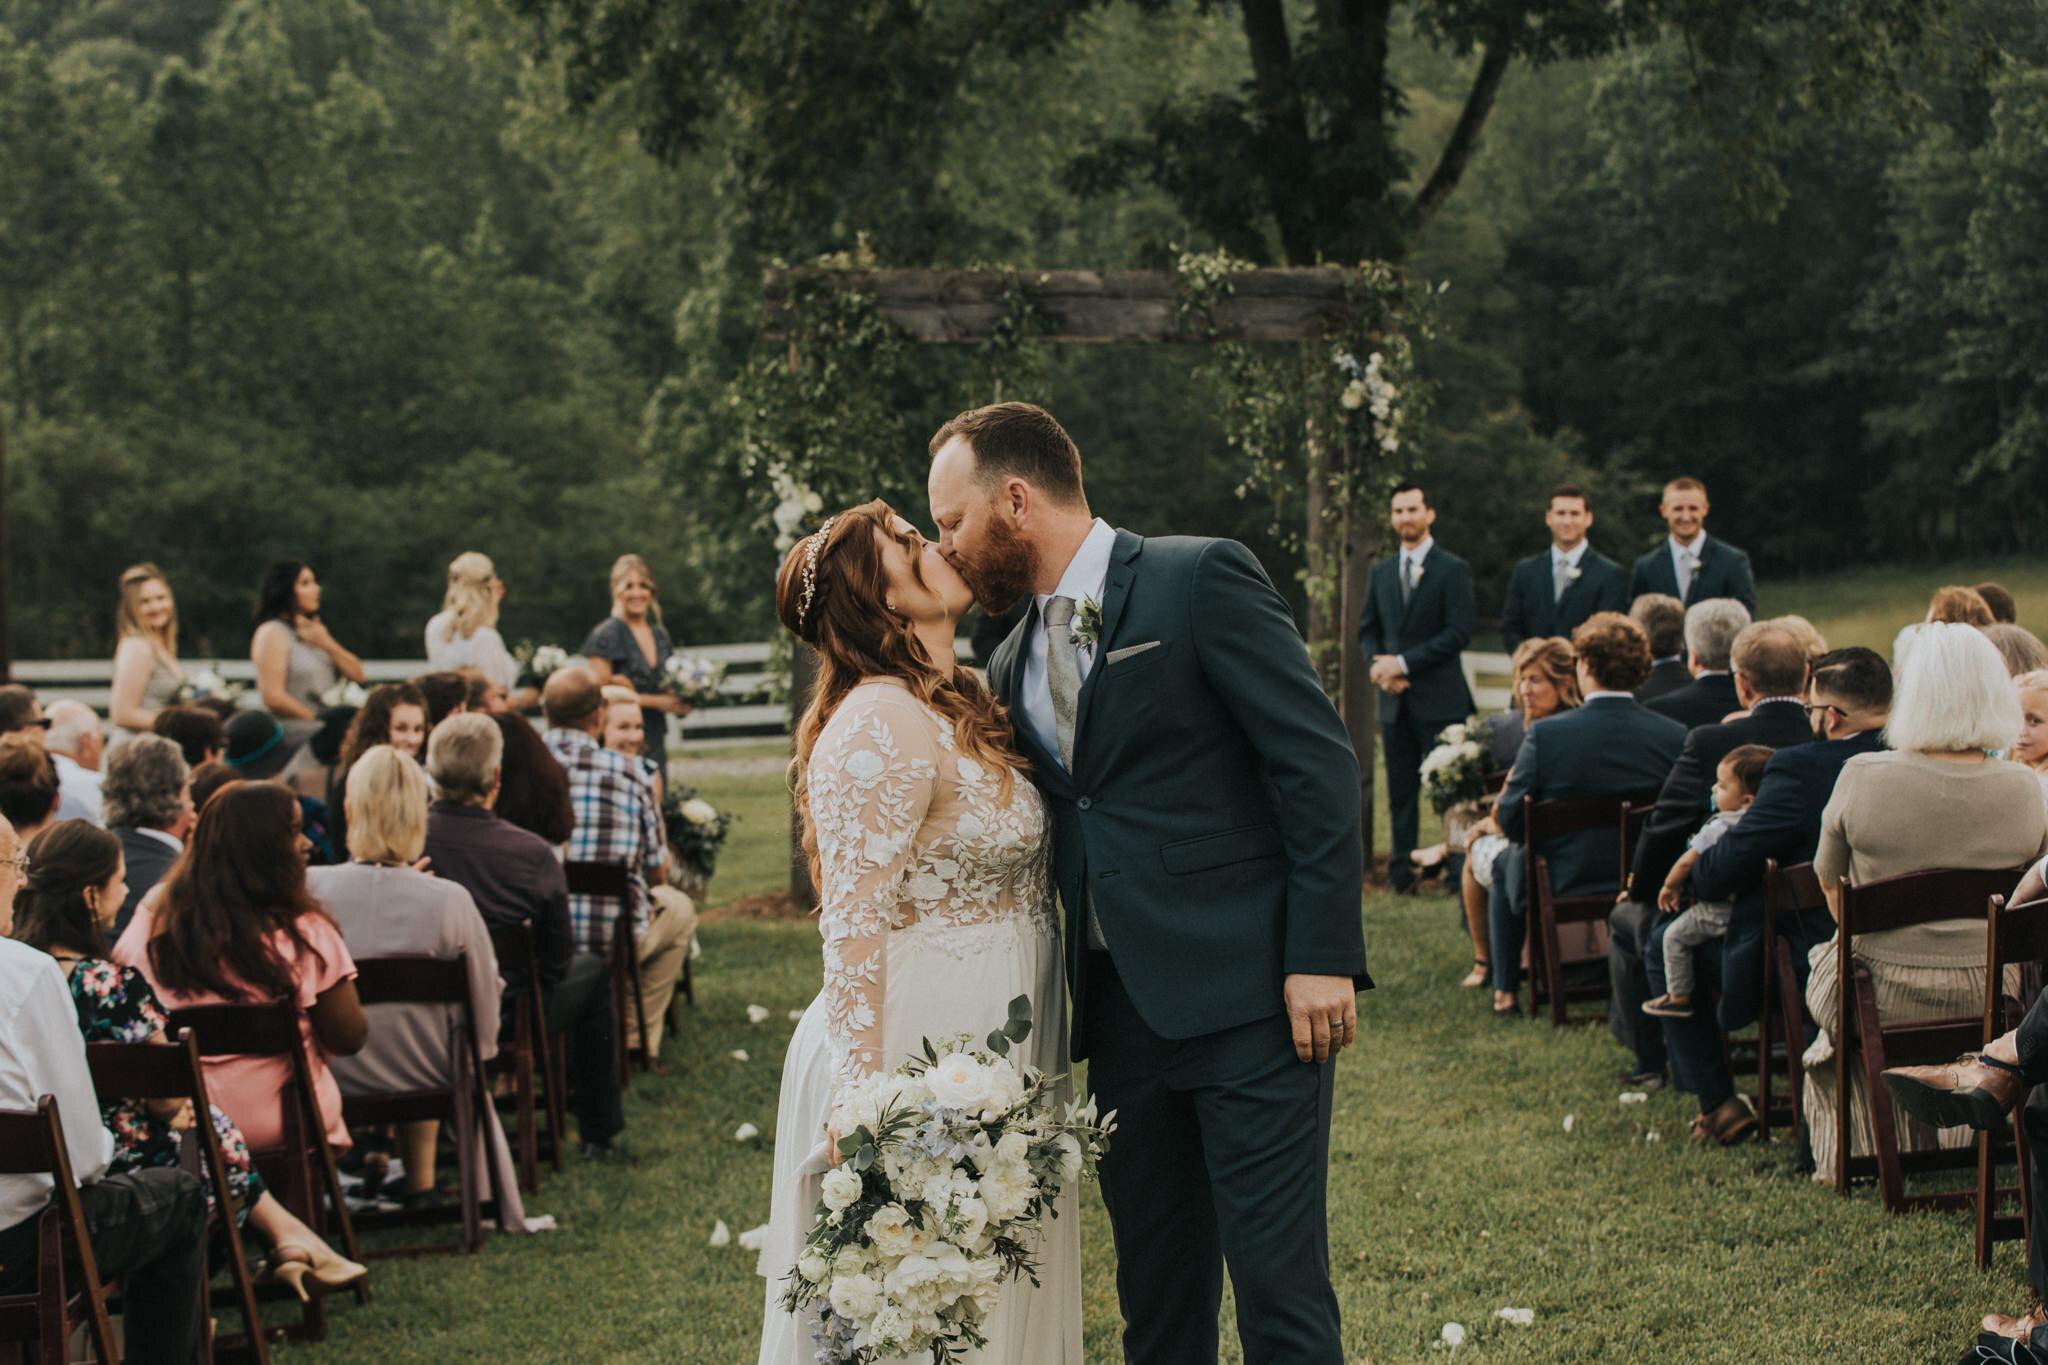 KateMatt-North-Georgia-Wedding-Photographer-Mountain-Laurel-Farm-114.jpg